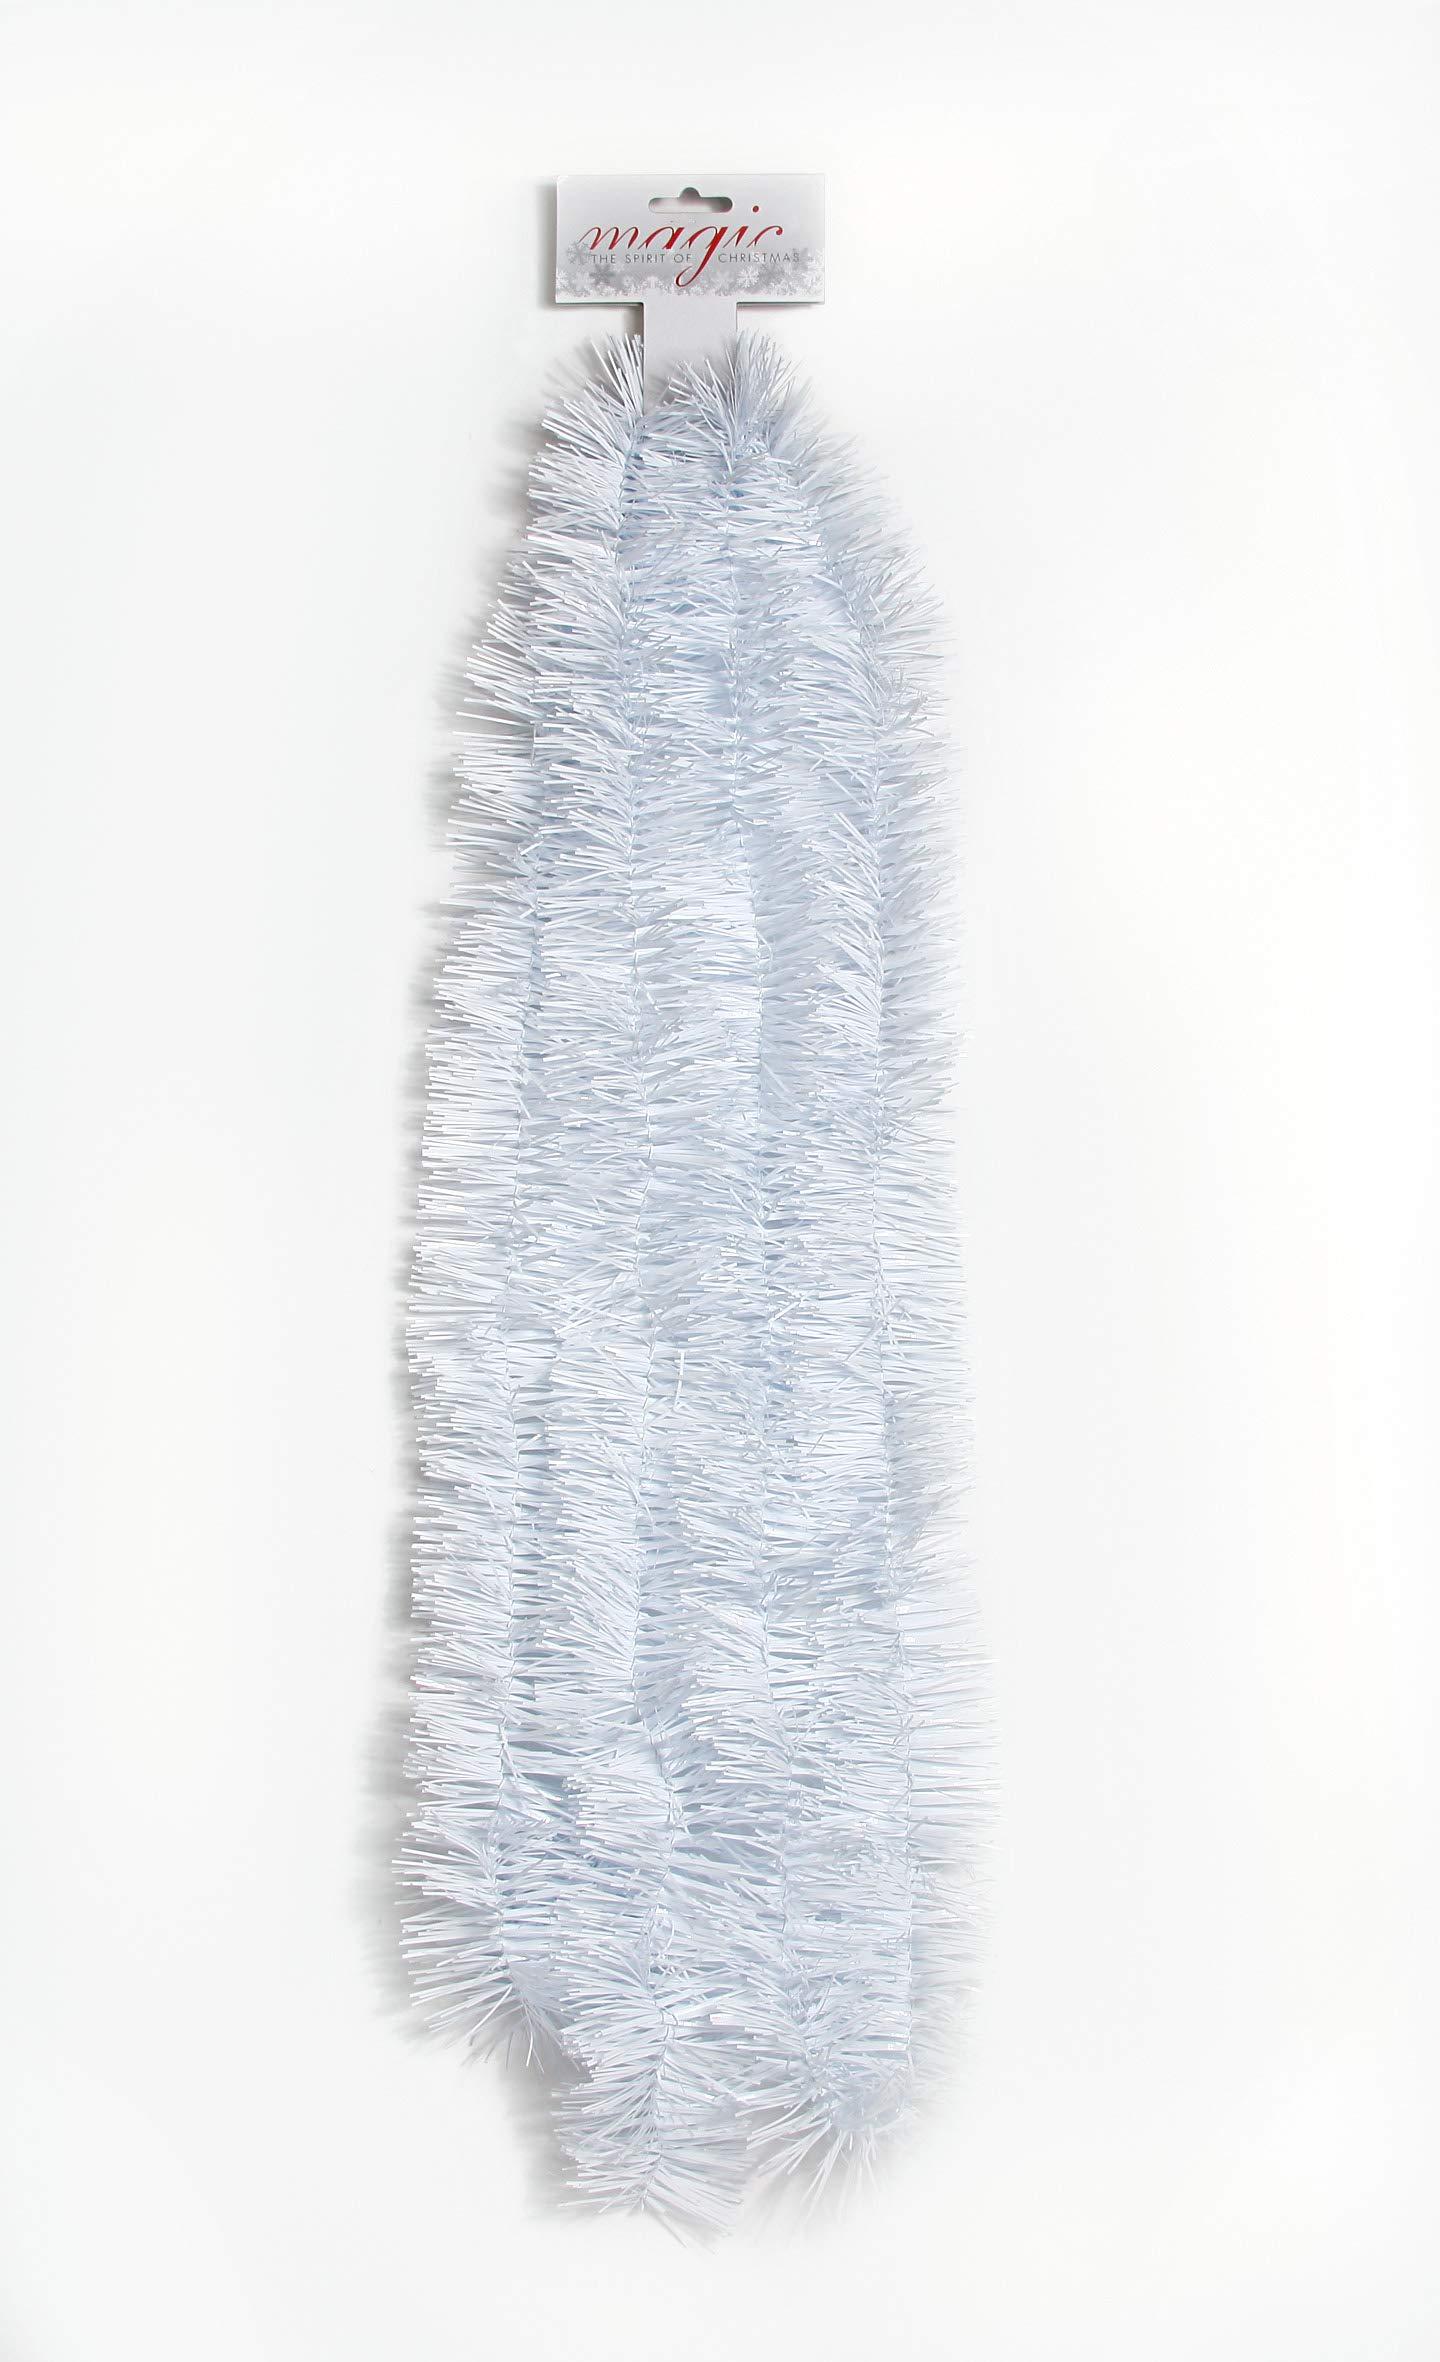 Inge-glas-Girlande-X-Mas-75cm27m-Glanz-Wei